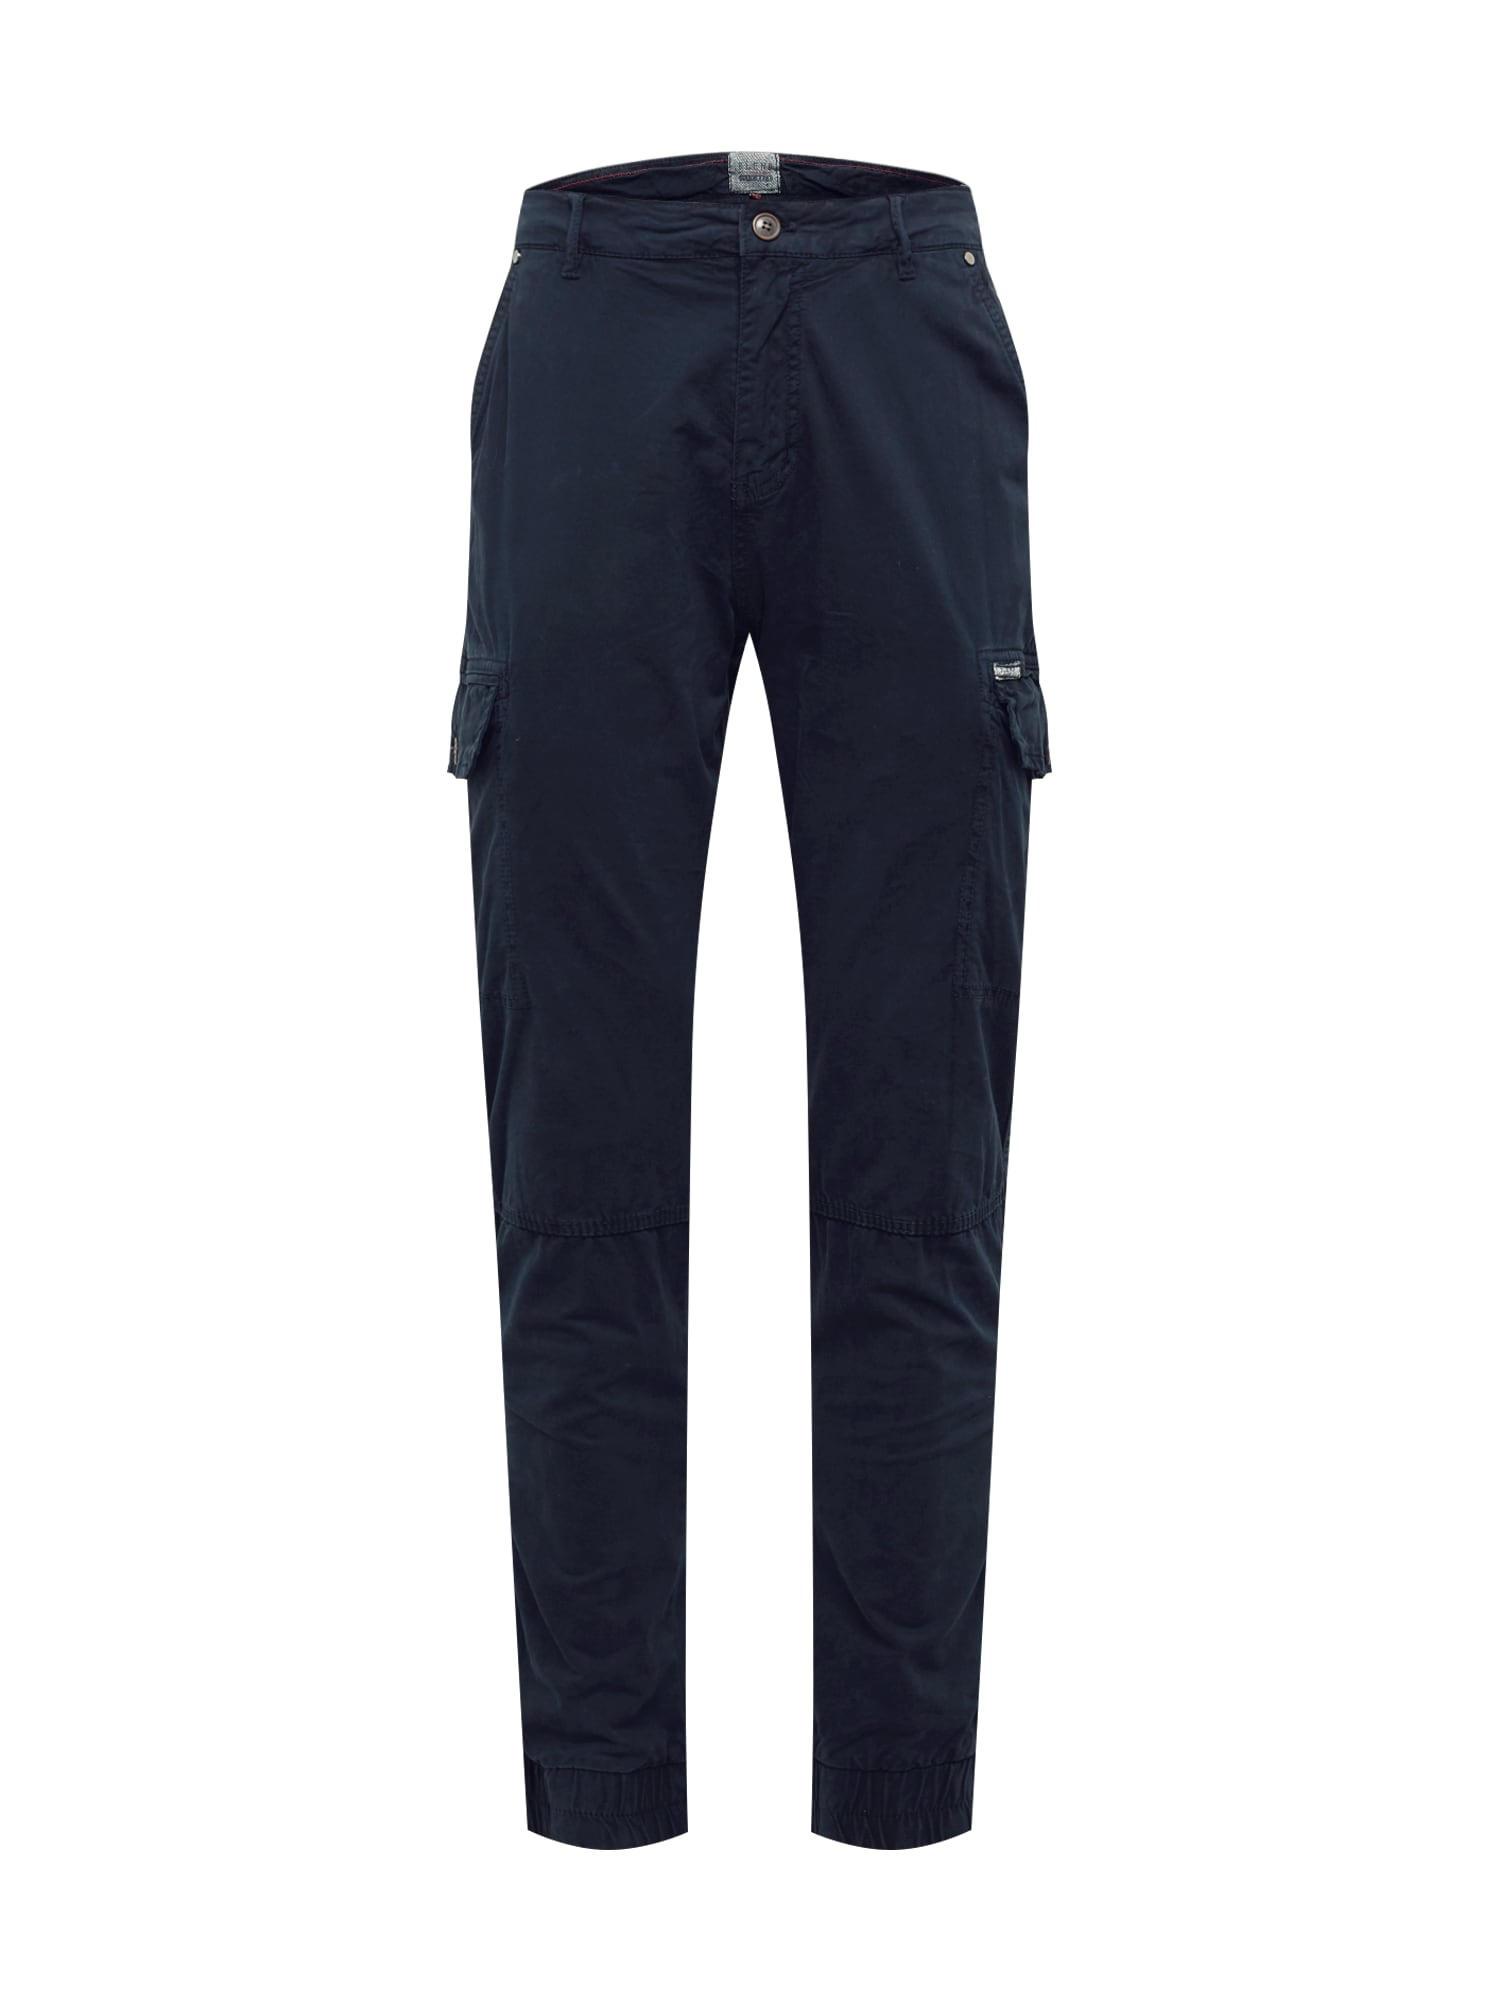 BLEND Laisvo stiliaus kelnės tamsiai mėlyna